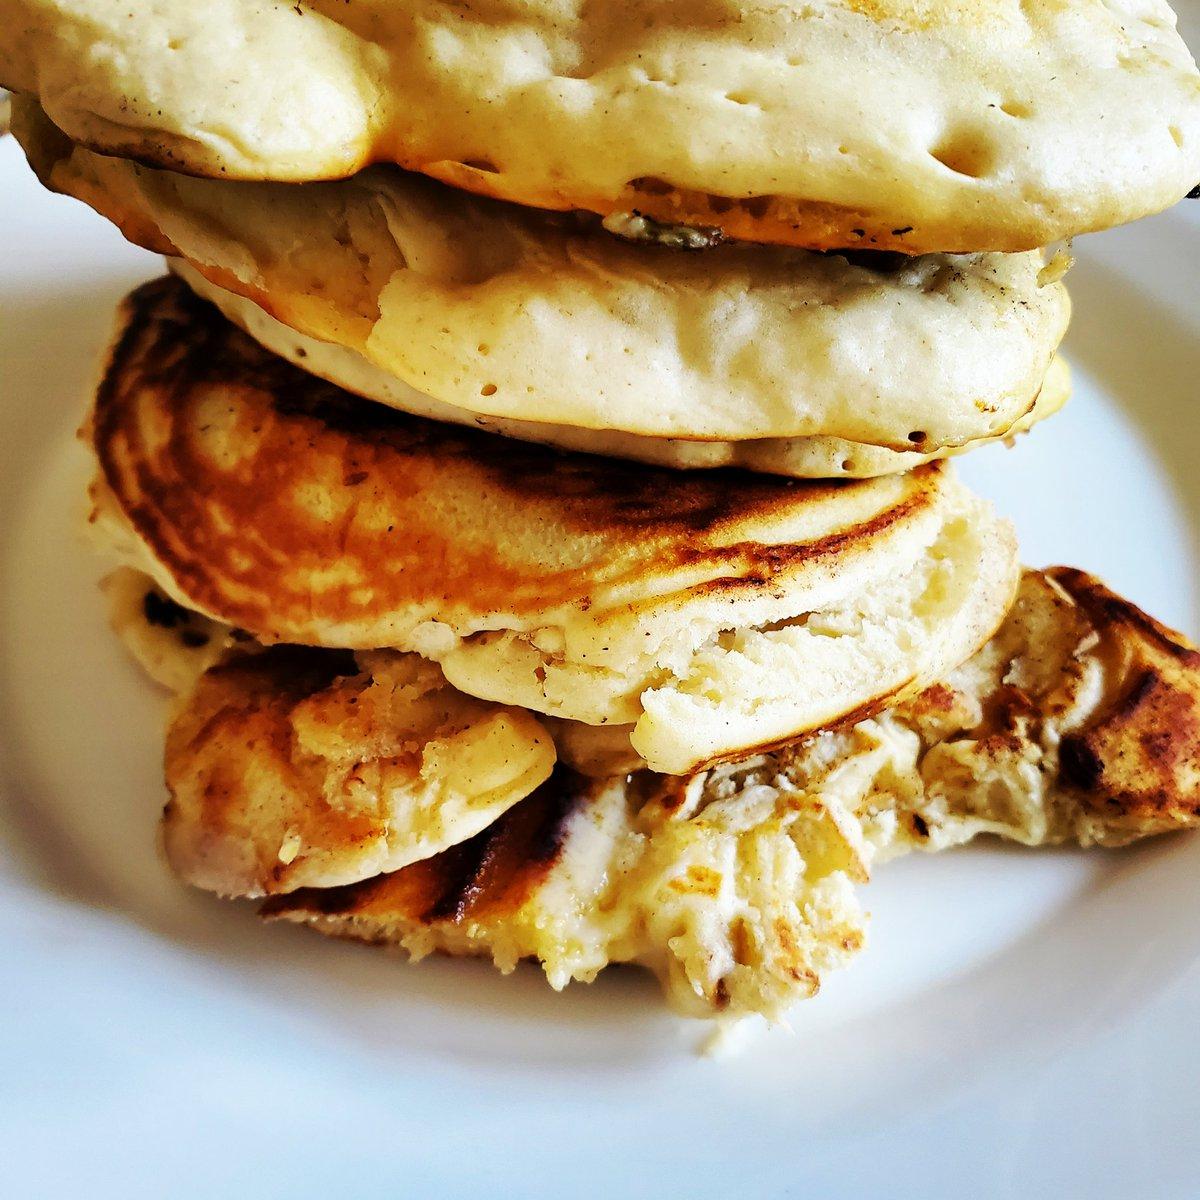 #SundayBrunch #SundayMorning #pancakes